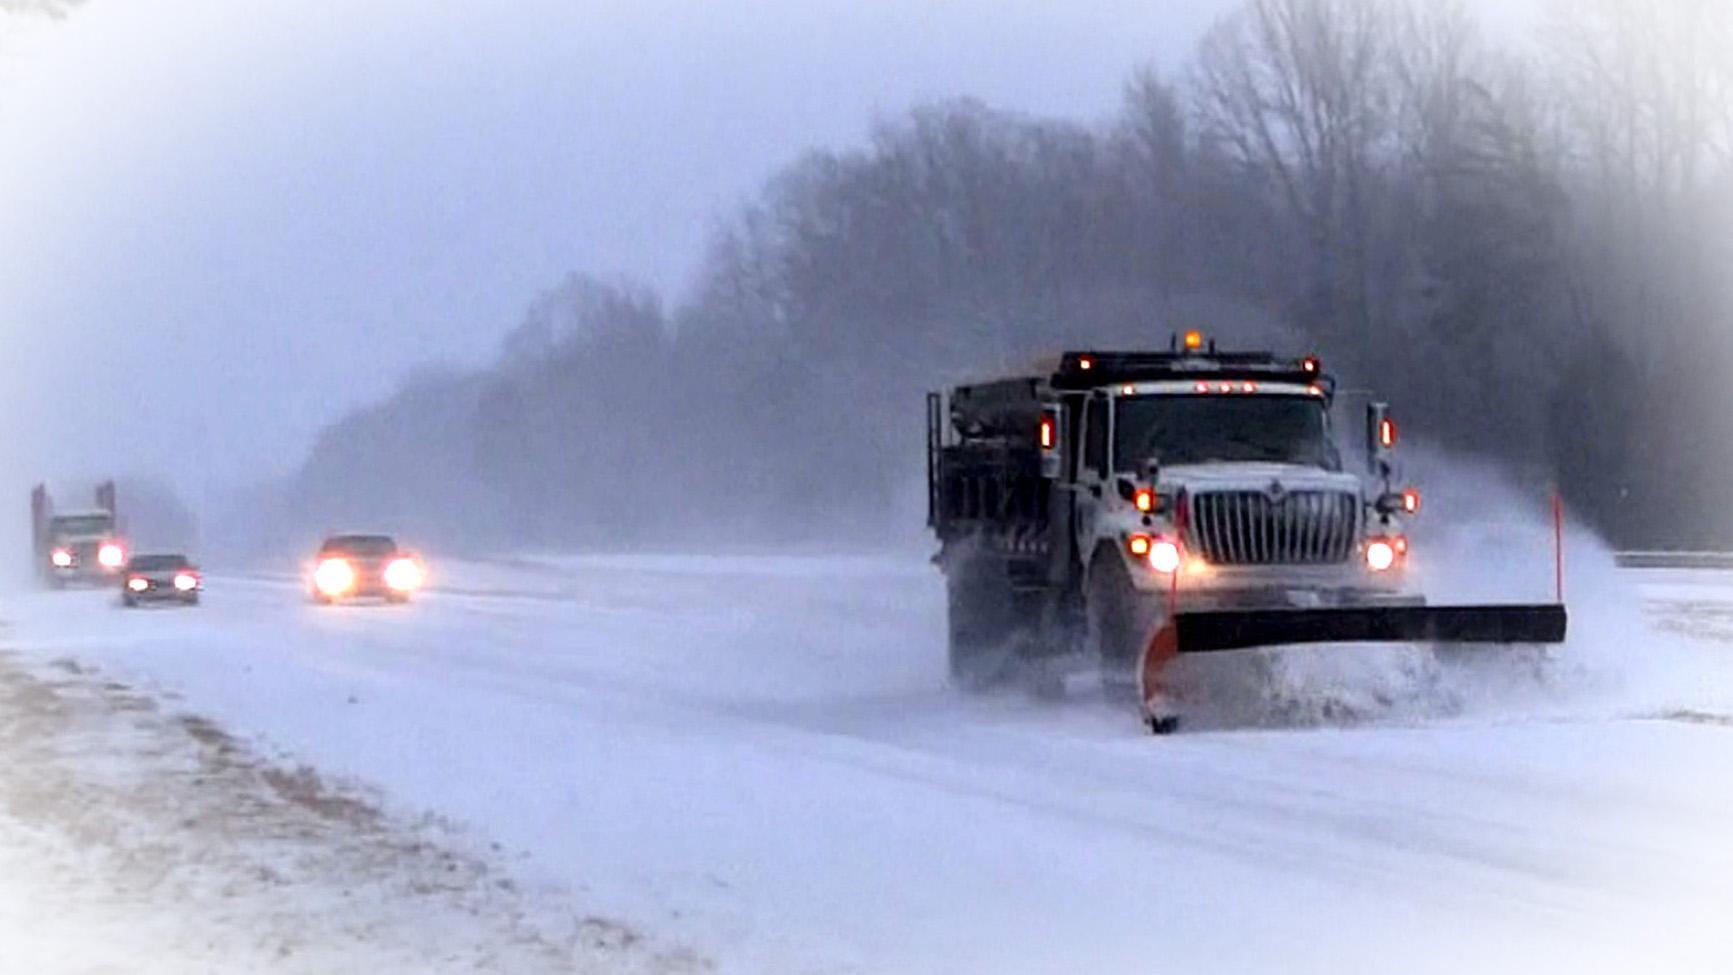 Winter Fuel Mix Affecting Fuel Economy